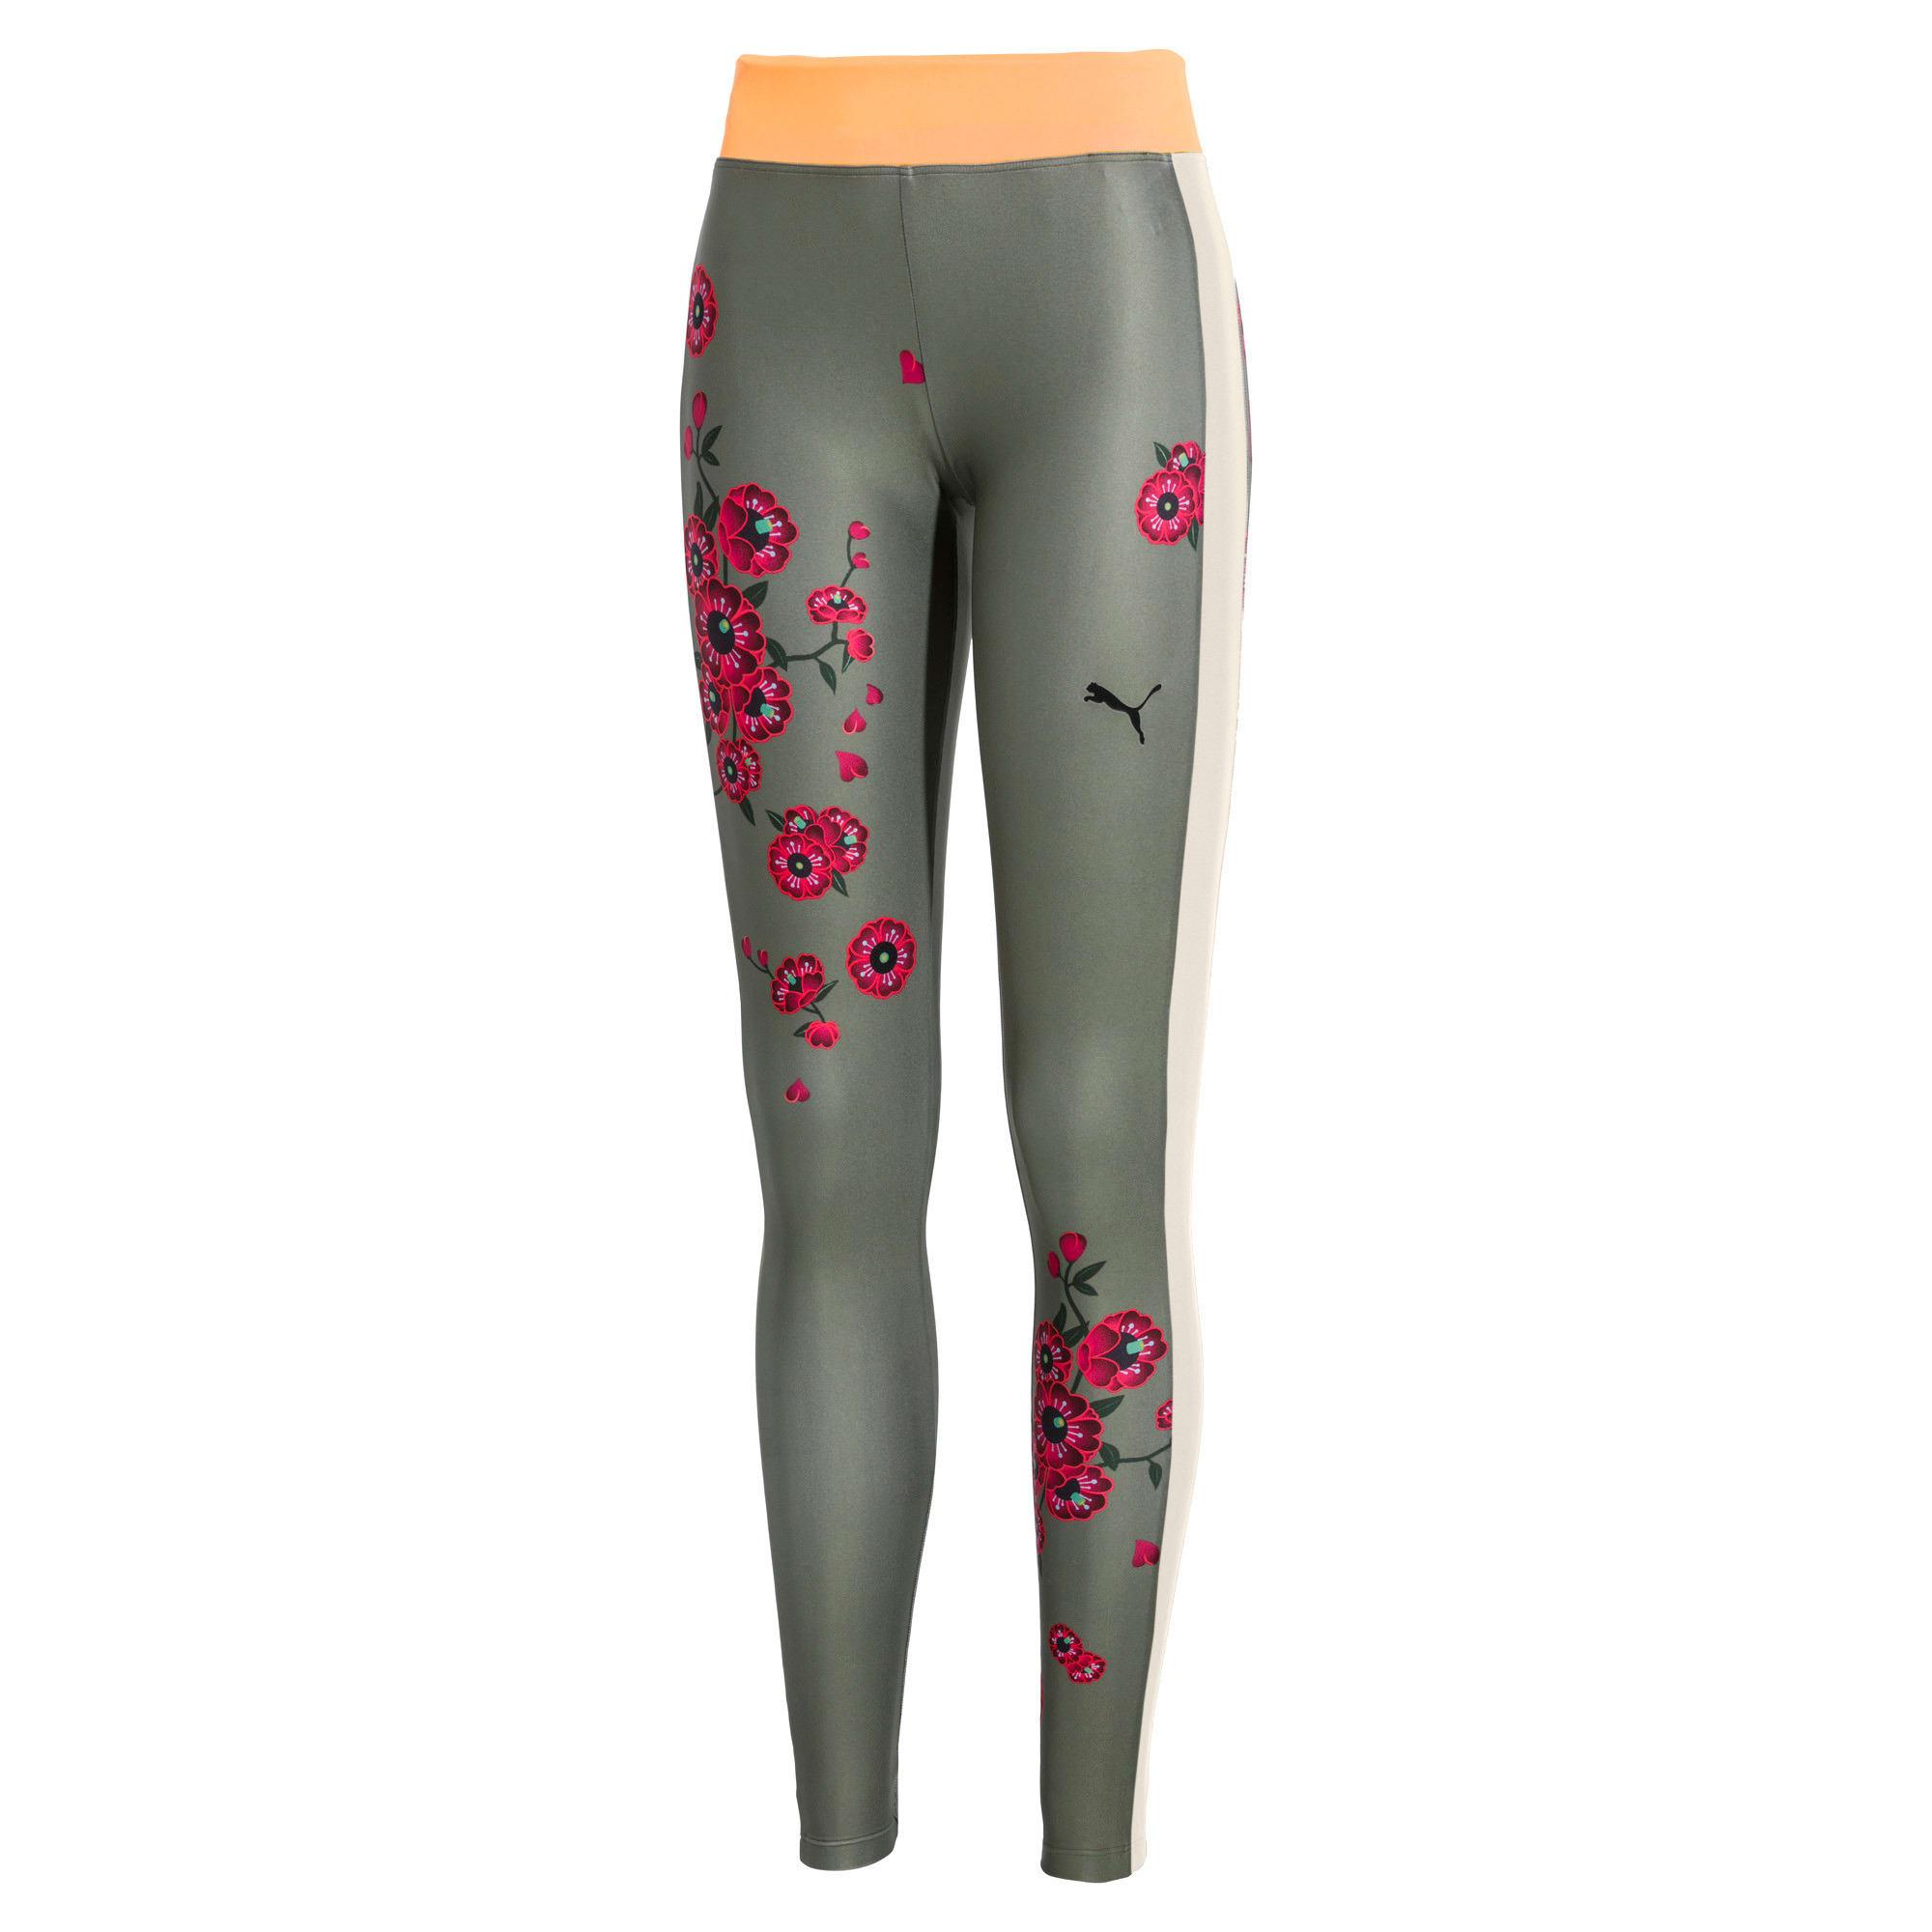 Thumbnail 1 van PUMA x SUE TSAI Blossom legging voor vrouwen, -Olivine, medium